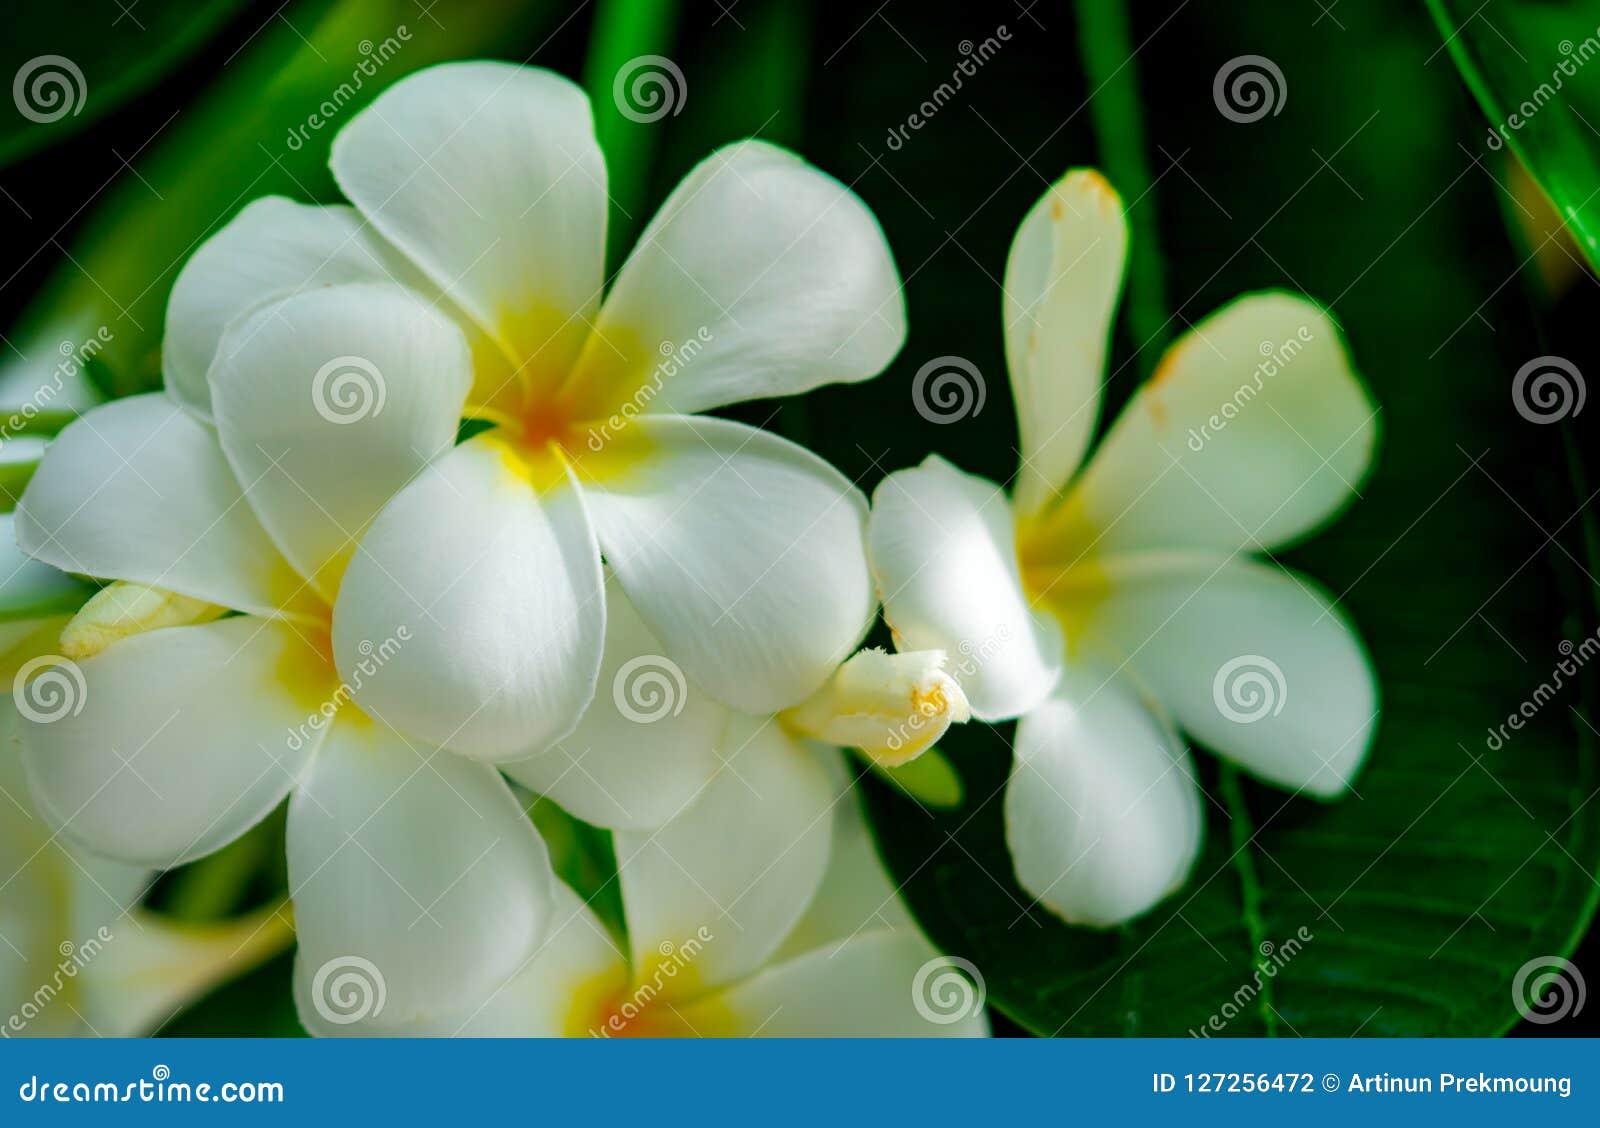 Frangipani flower plumeria alba with green leaves on blurred frangipani flower plumeria alba with green leaves on blurred background white flowers with yellow at mightylinksfo